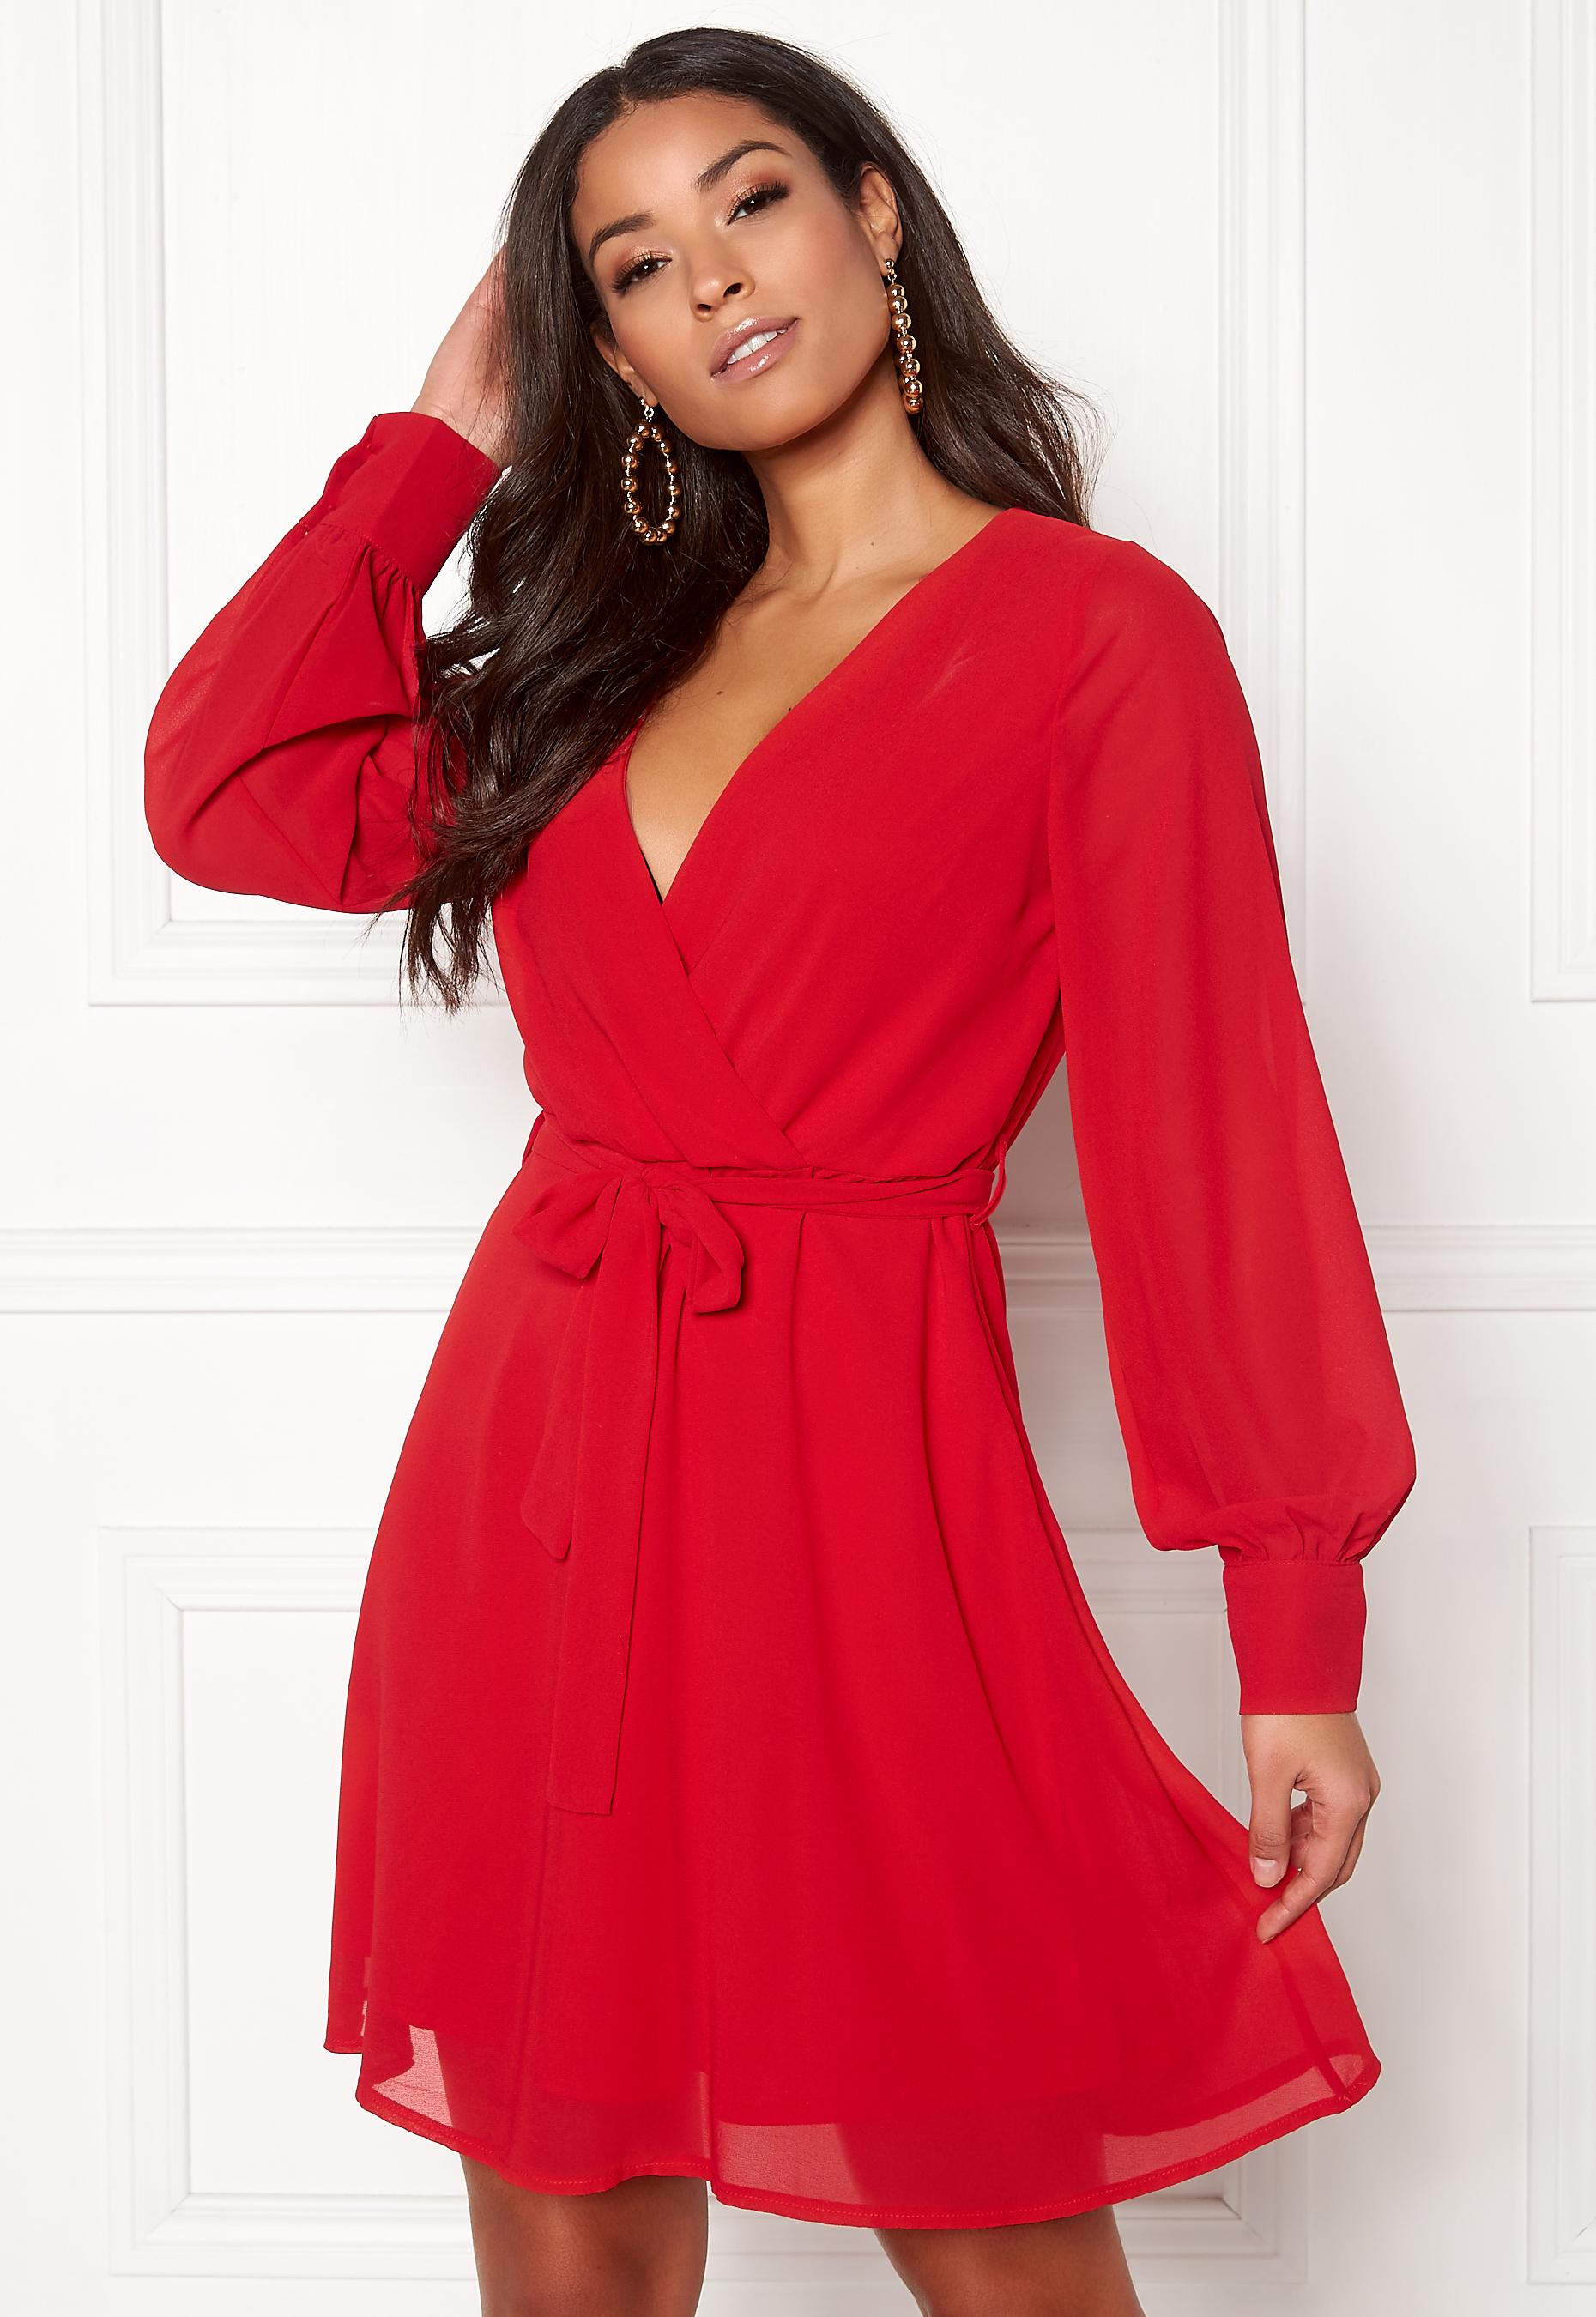 Sisters Point Gerdo Dress 500 Red - Bubbleroom 5e6f1e1948d9d